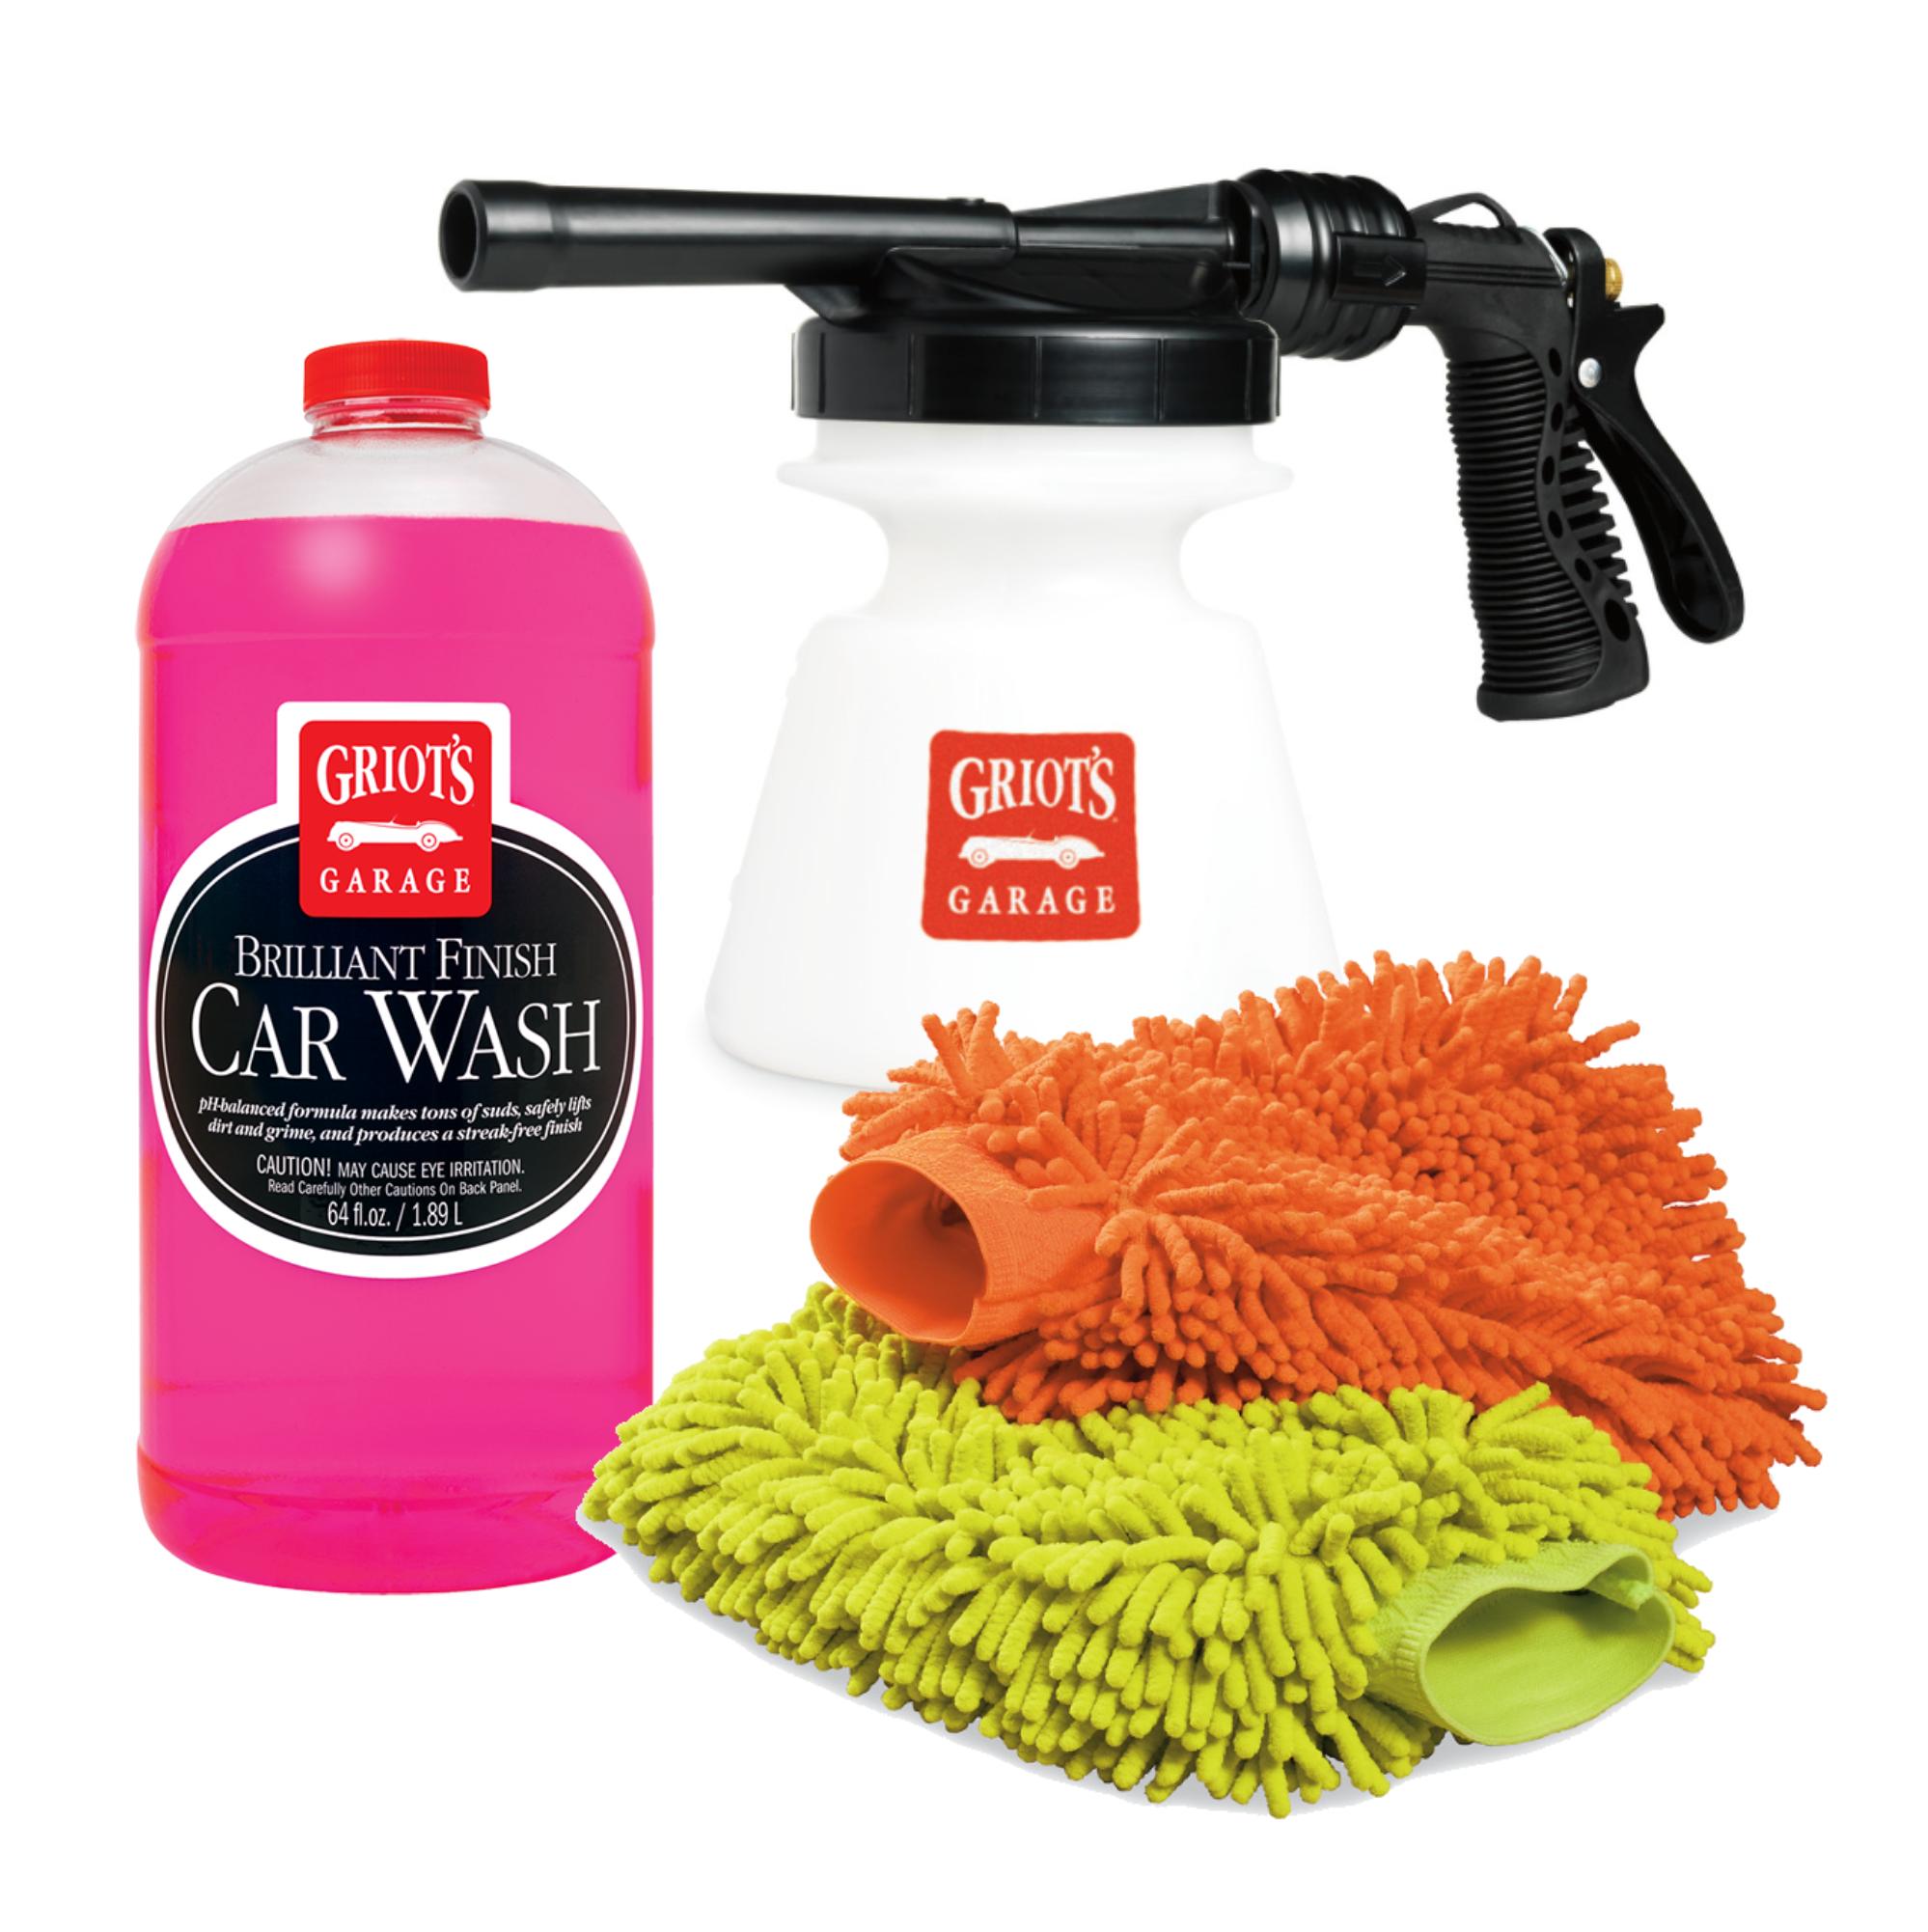 Griot's Foaming Car Wash Kit